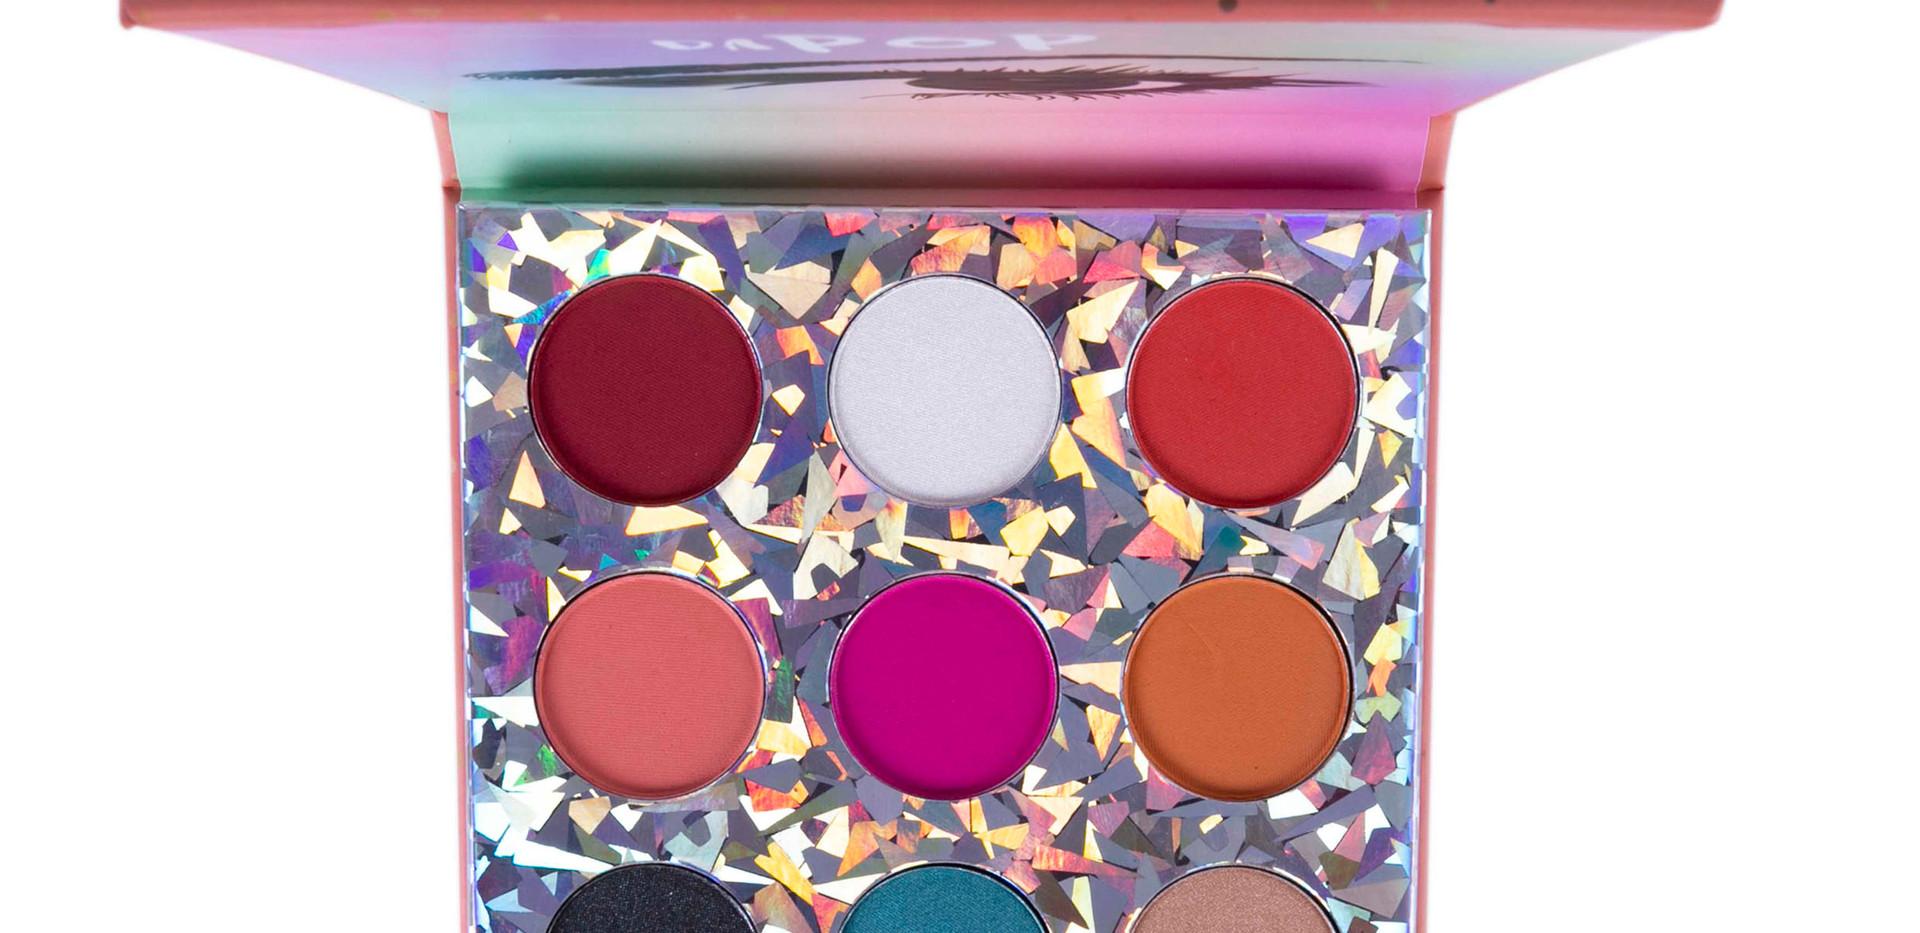 Paleta de Sombras Sparkling Dapop - HB97761